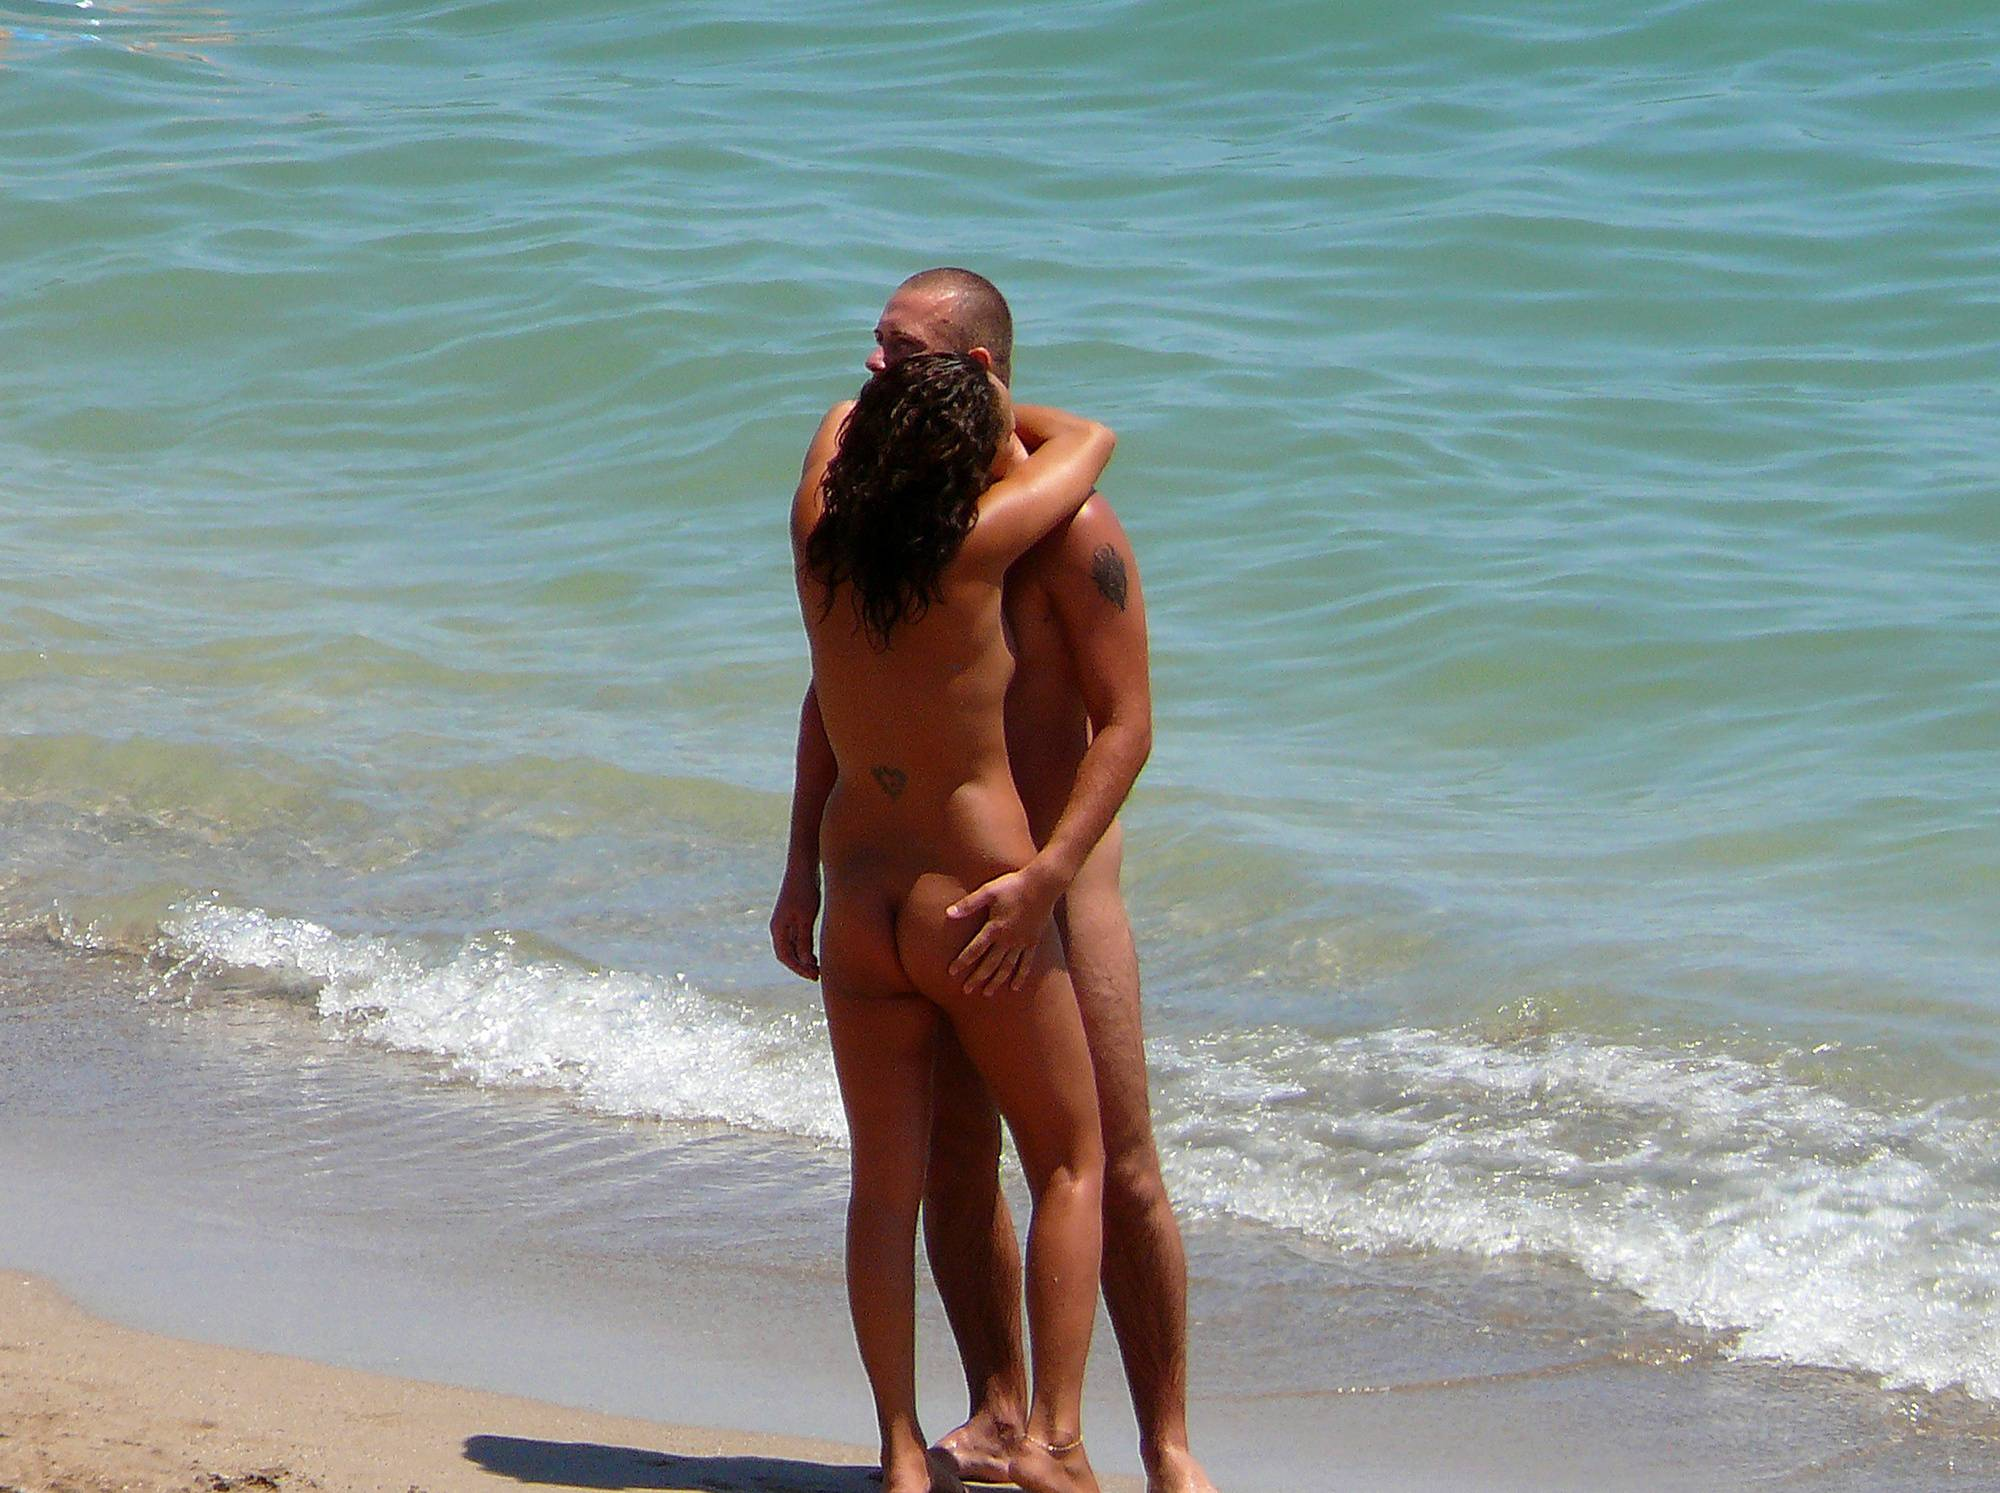 Nudist Pictures Romanian Beach Series - 2